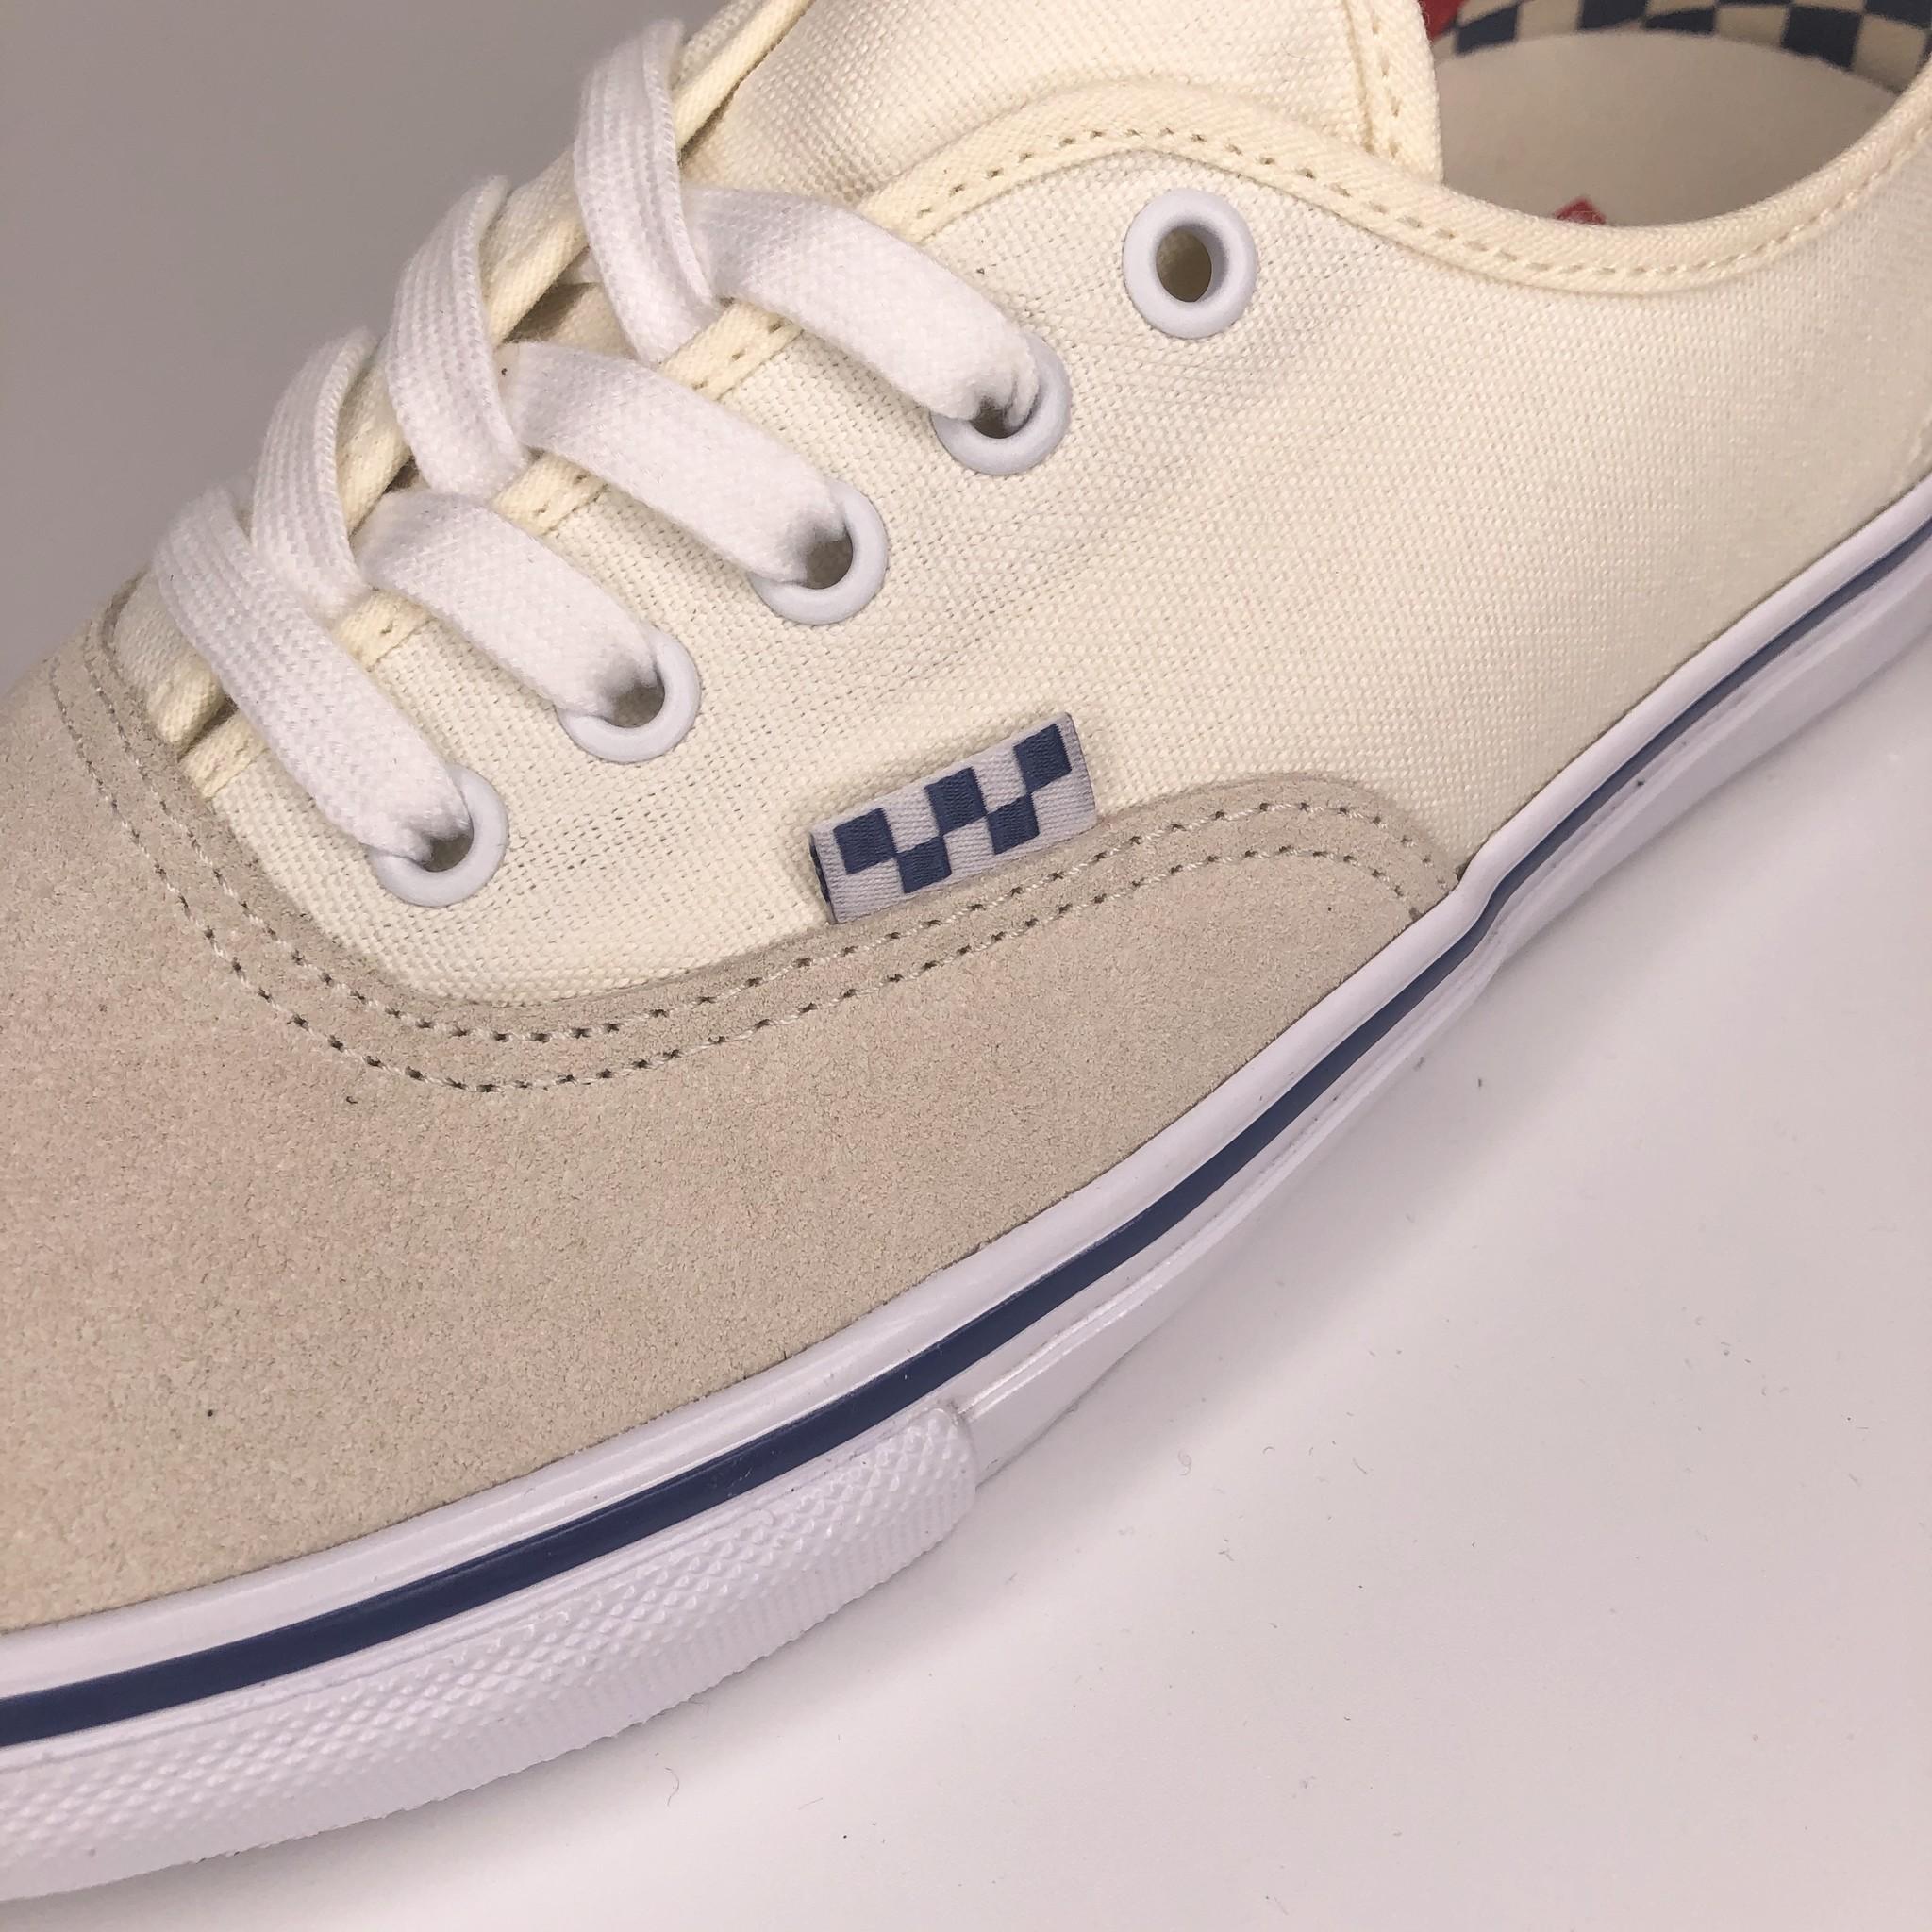 Vans Skate Classics Shoes Online Canada Slip On Old Skool Authentic Half Cab